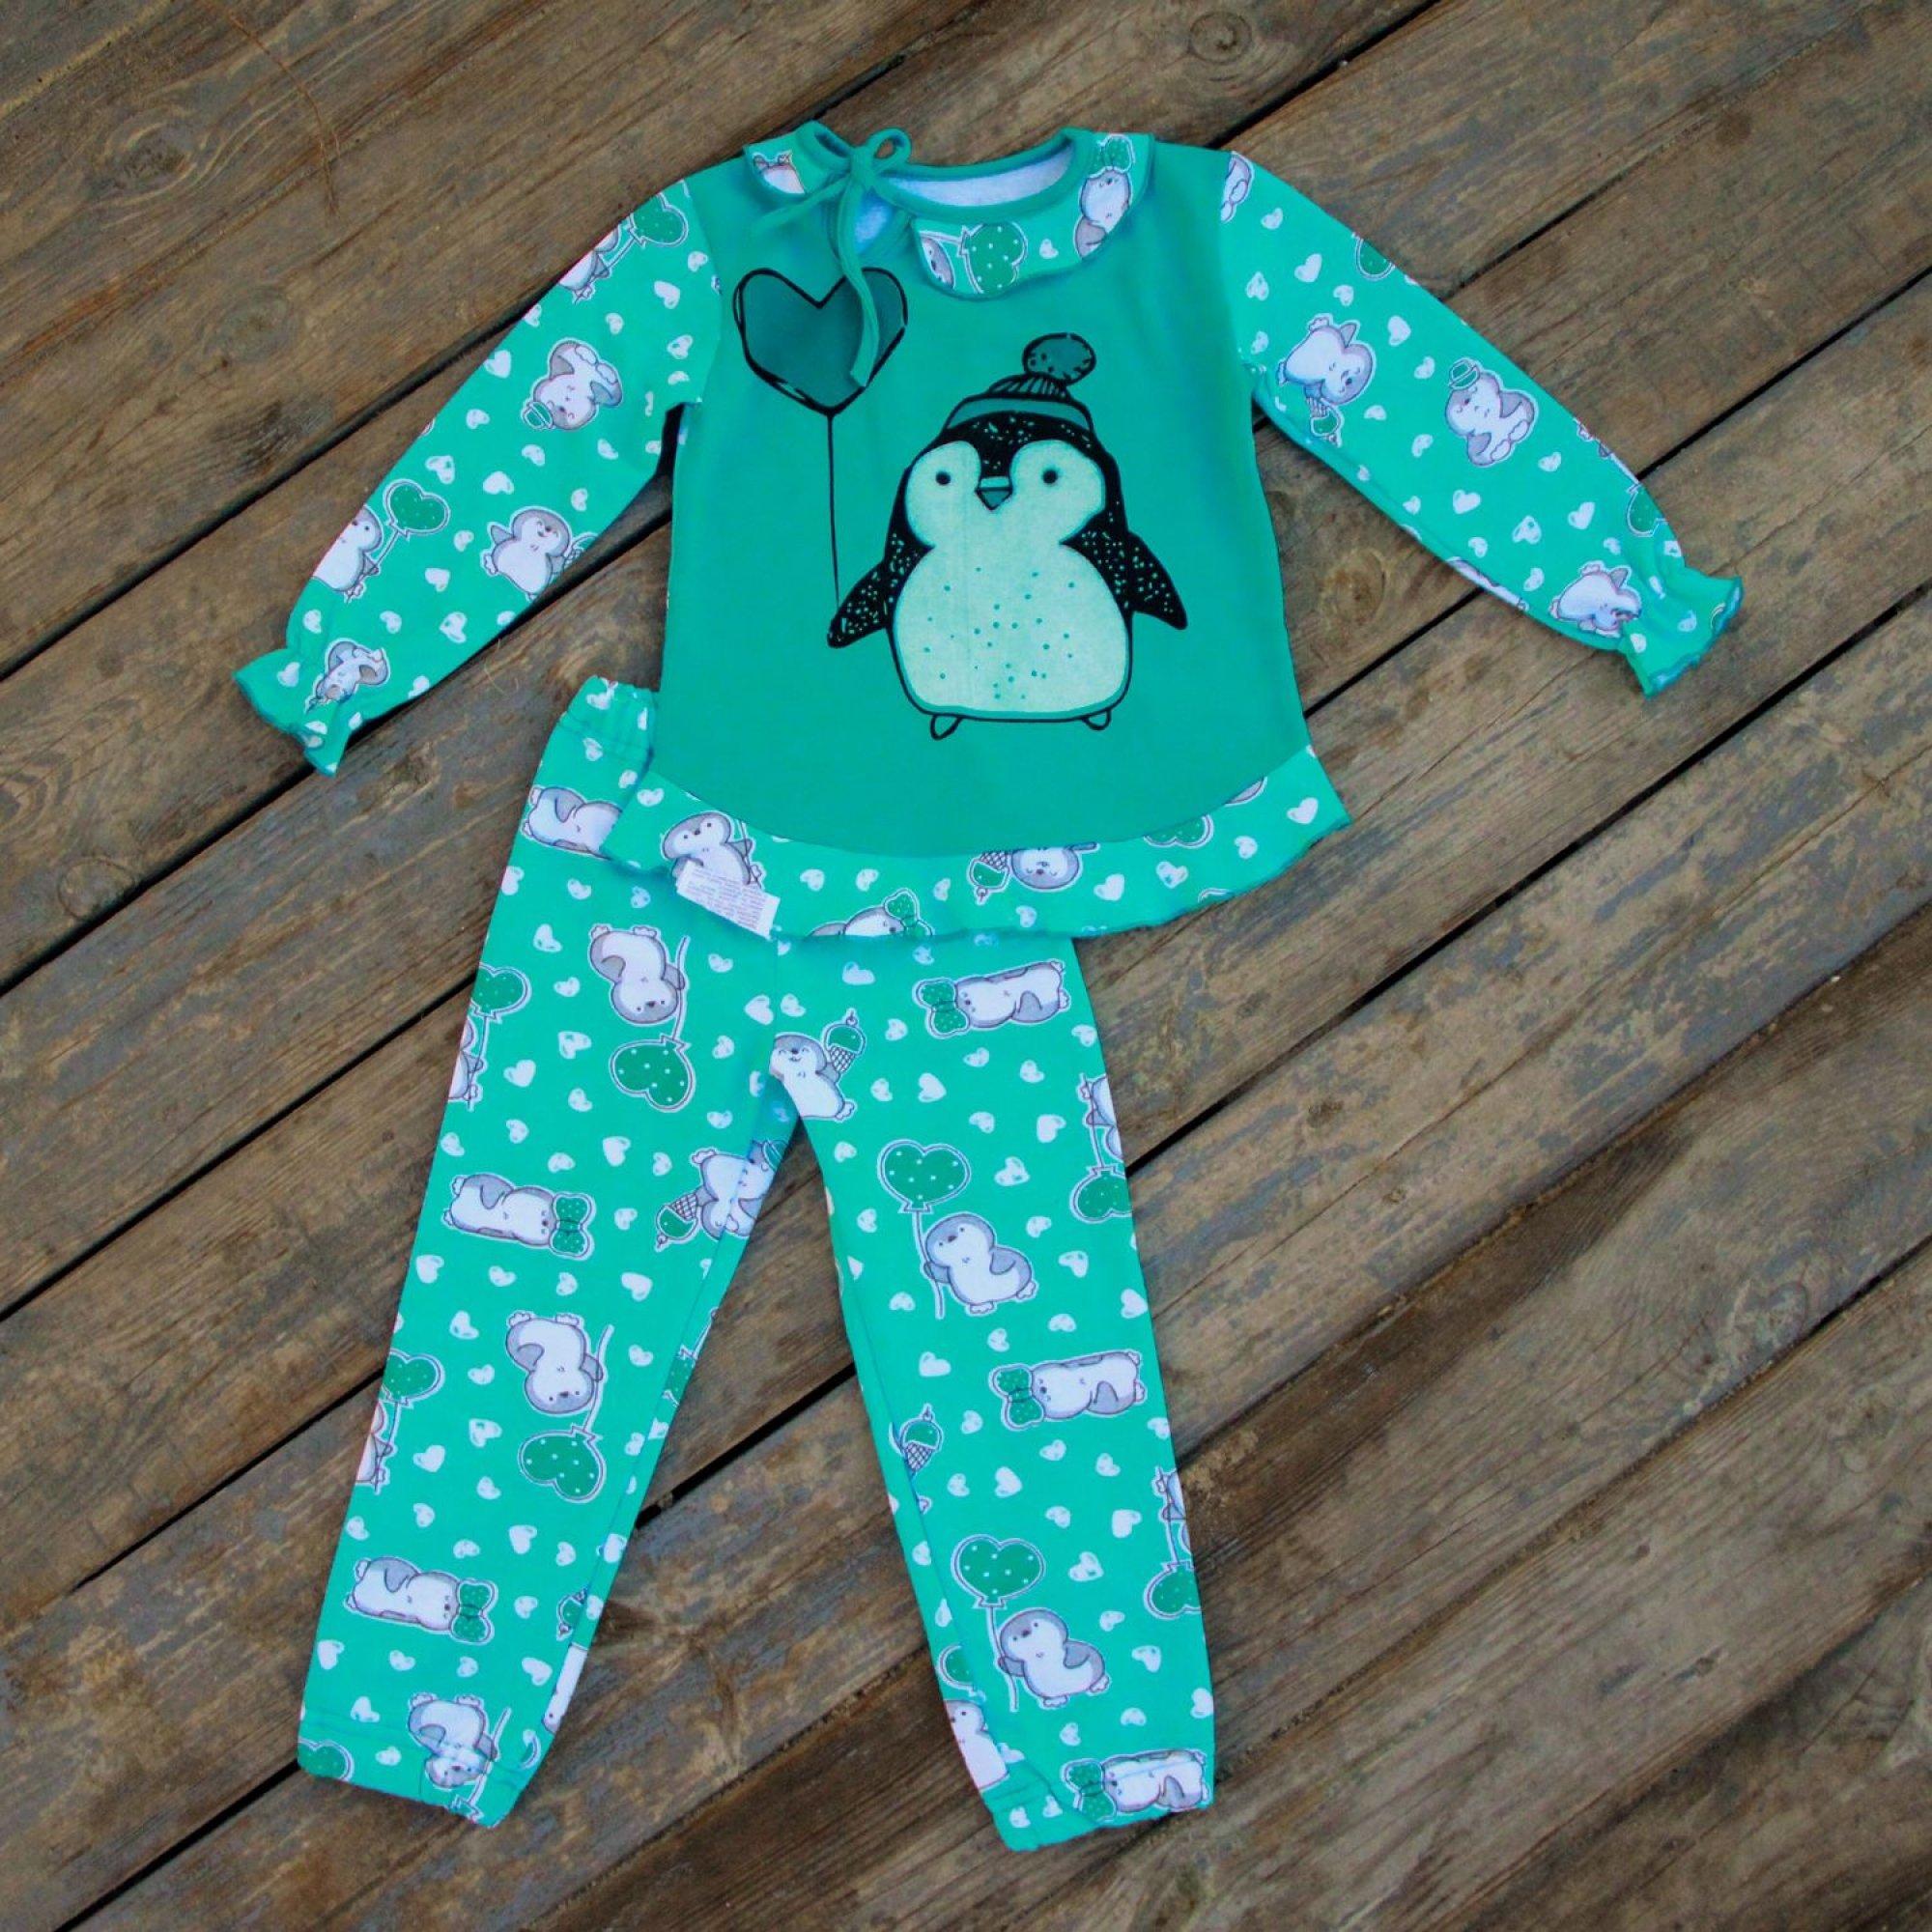 детская пижама, раздельная пижама